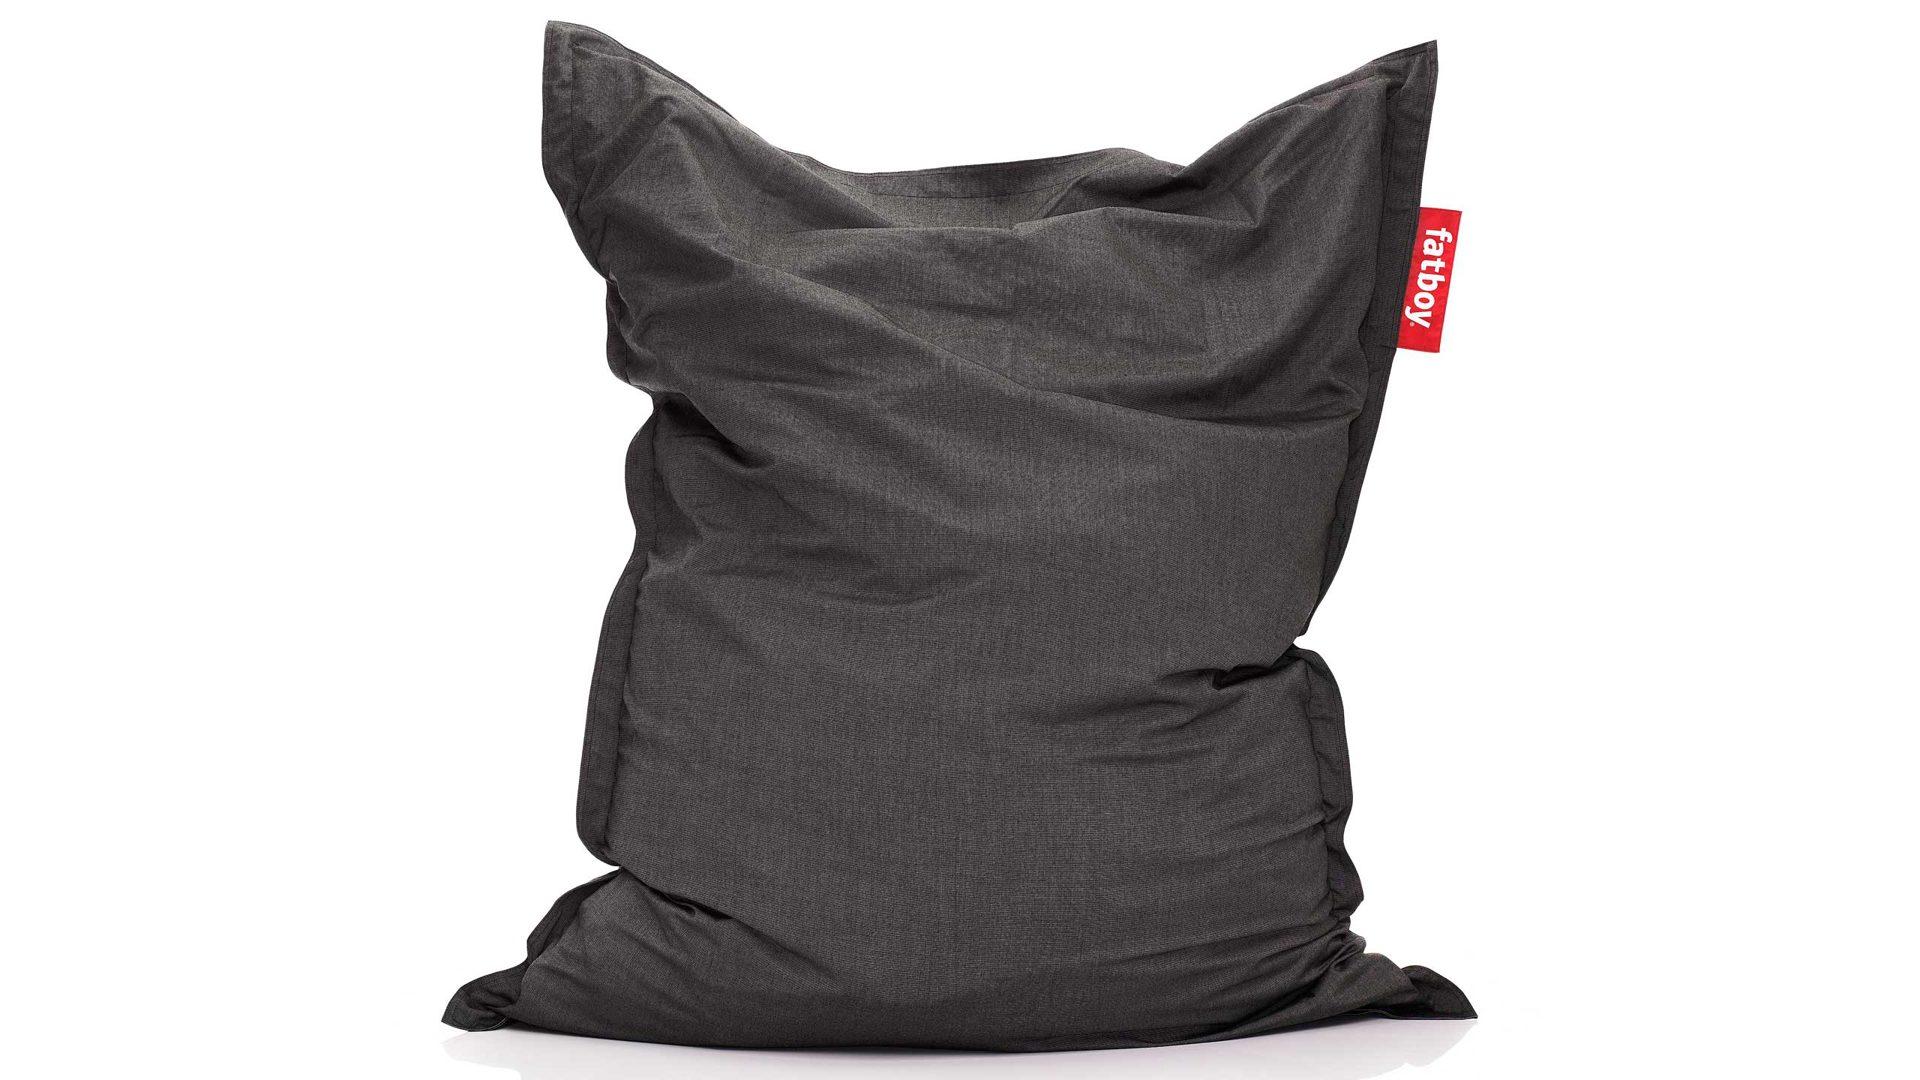 Fatboy Sitzsack Original Outdoor Charcoal Anthrazit 180 X 140 Cm Sitzsack In Anthrazit